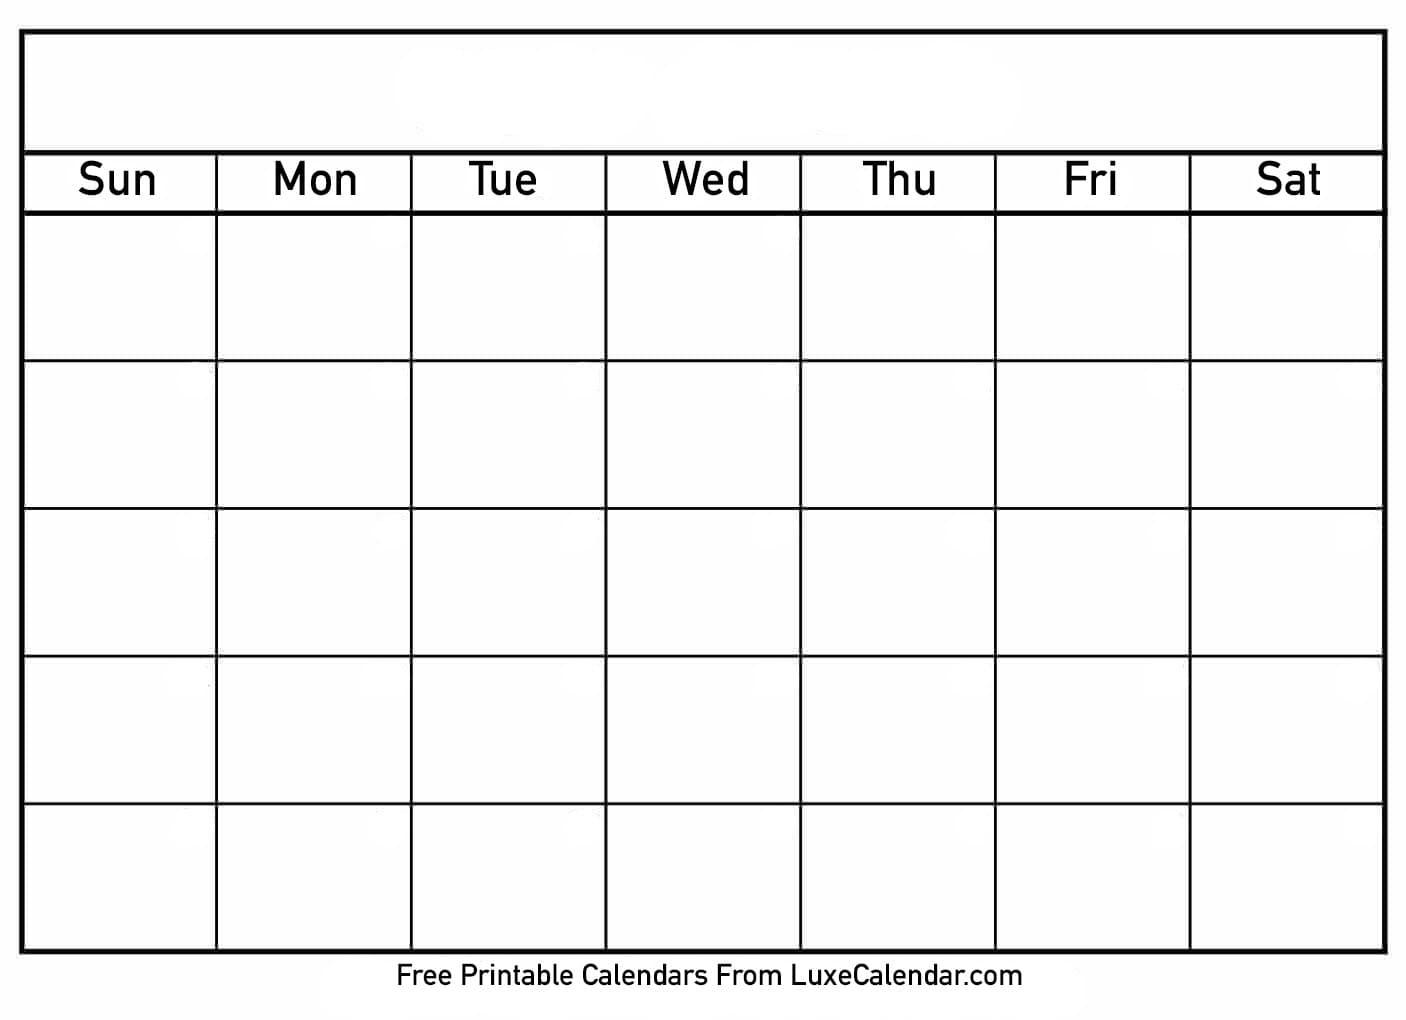 Blank Printable Calendar - Luxe Calendar_Print A Blank Calendar Page